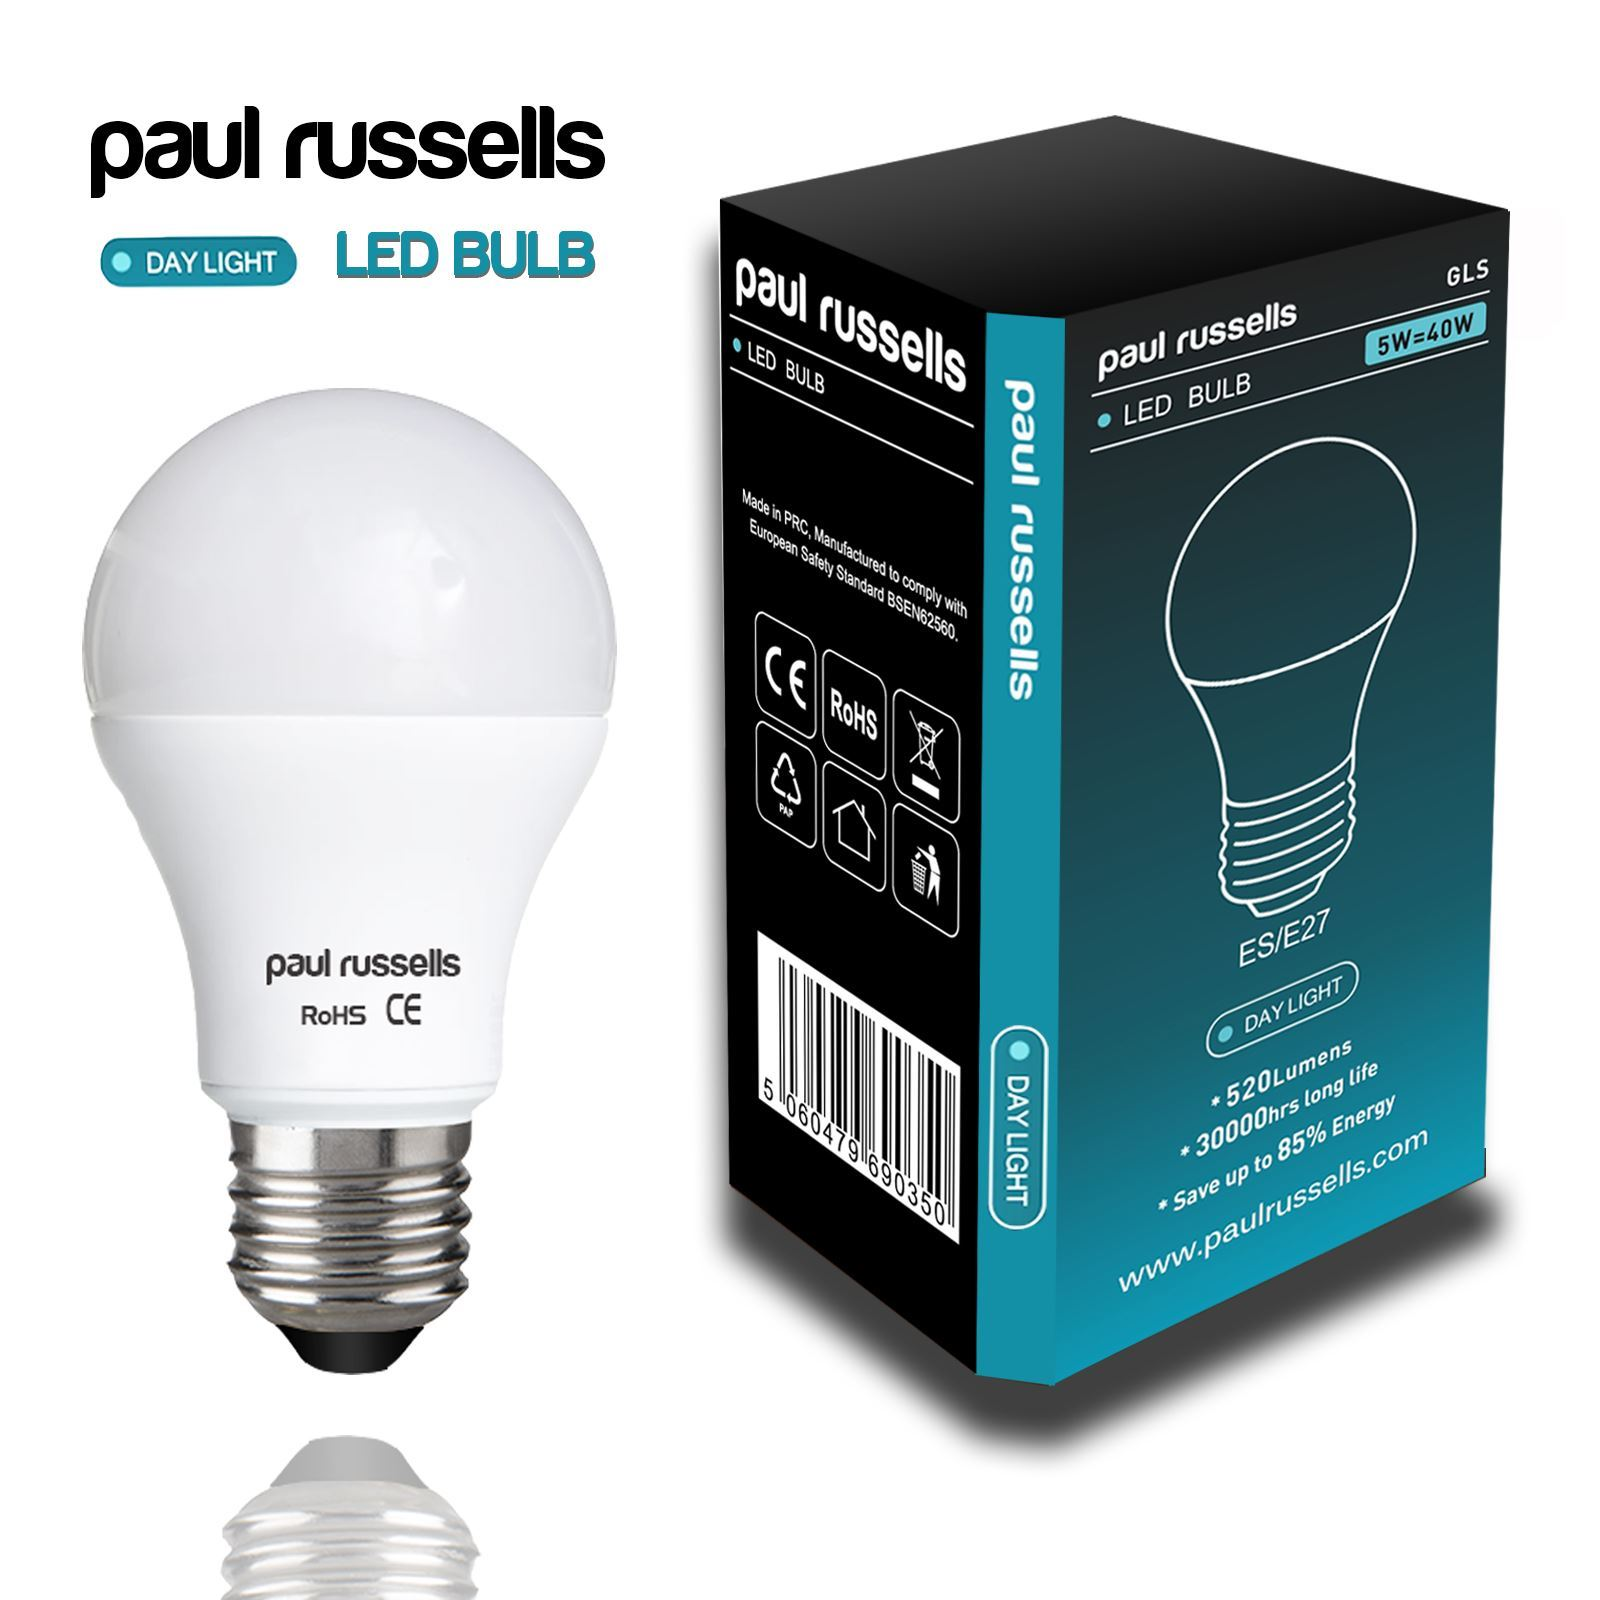 Low Energy Mini GLS Bulb 240 Lumen E14 Small Screw Cap 5W